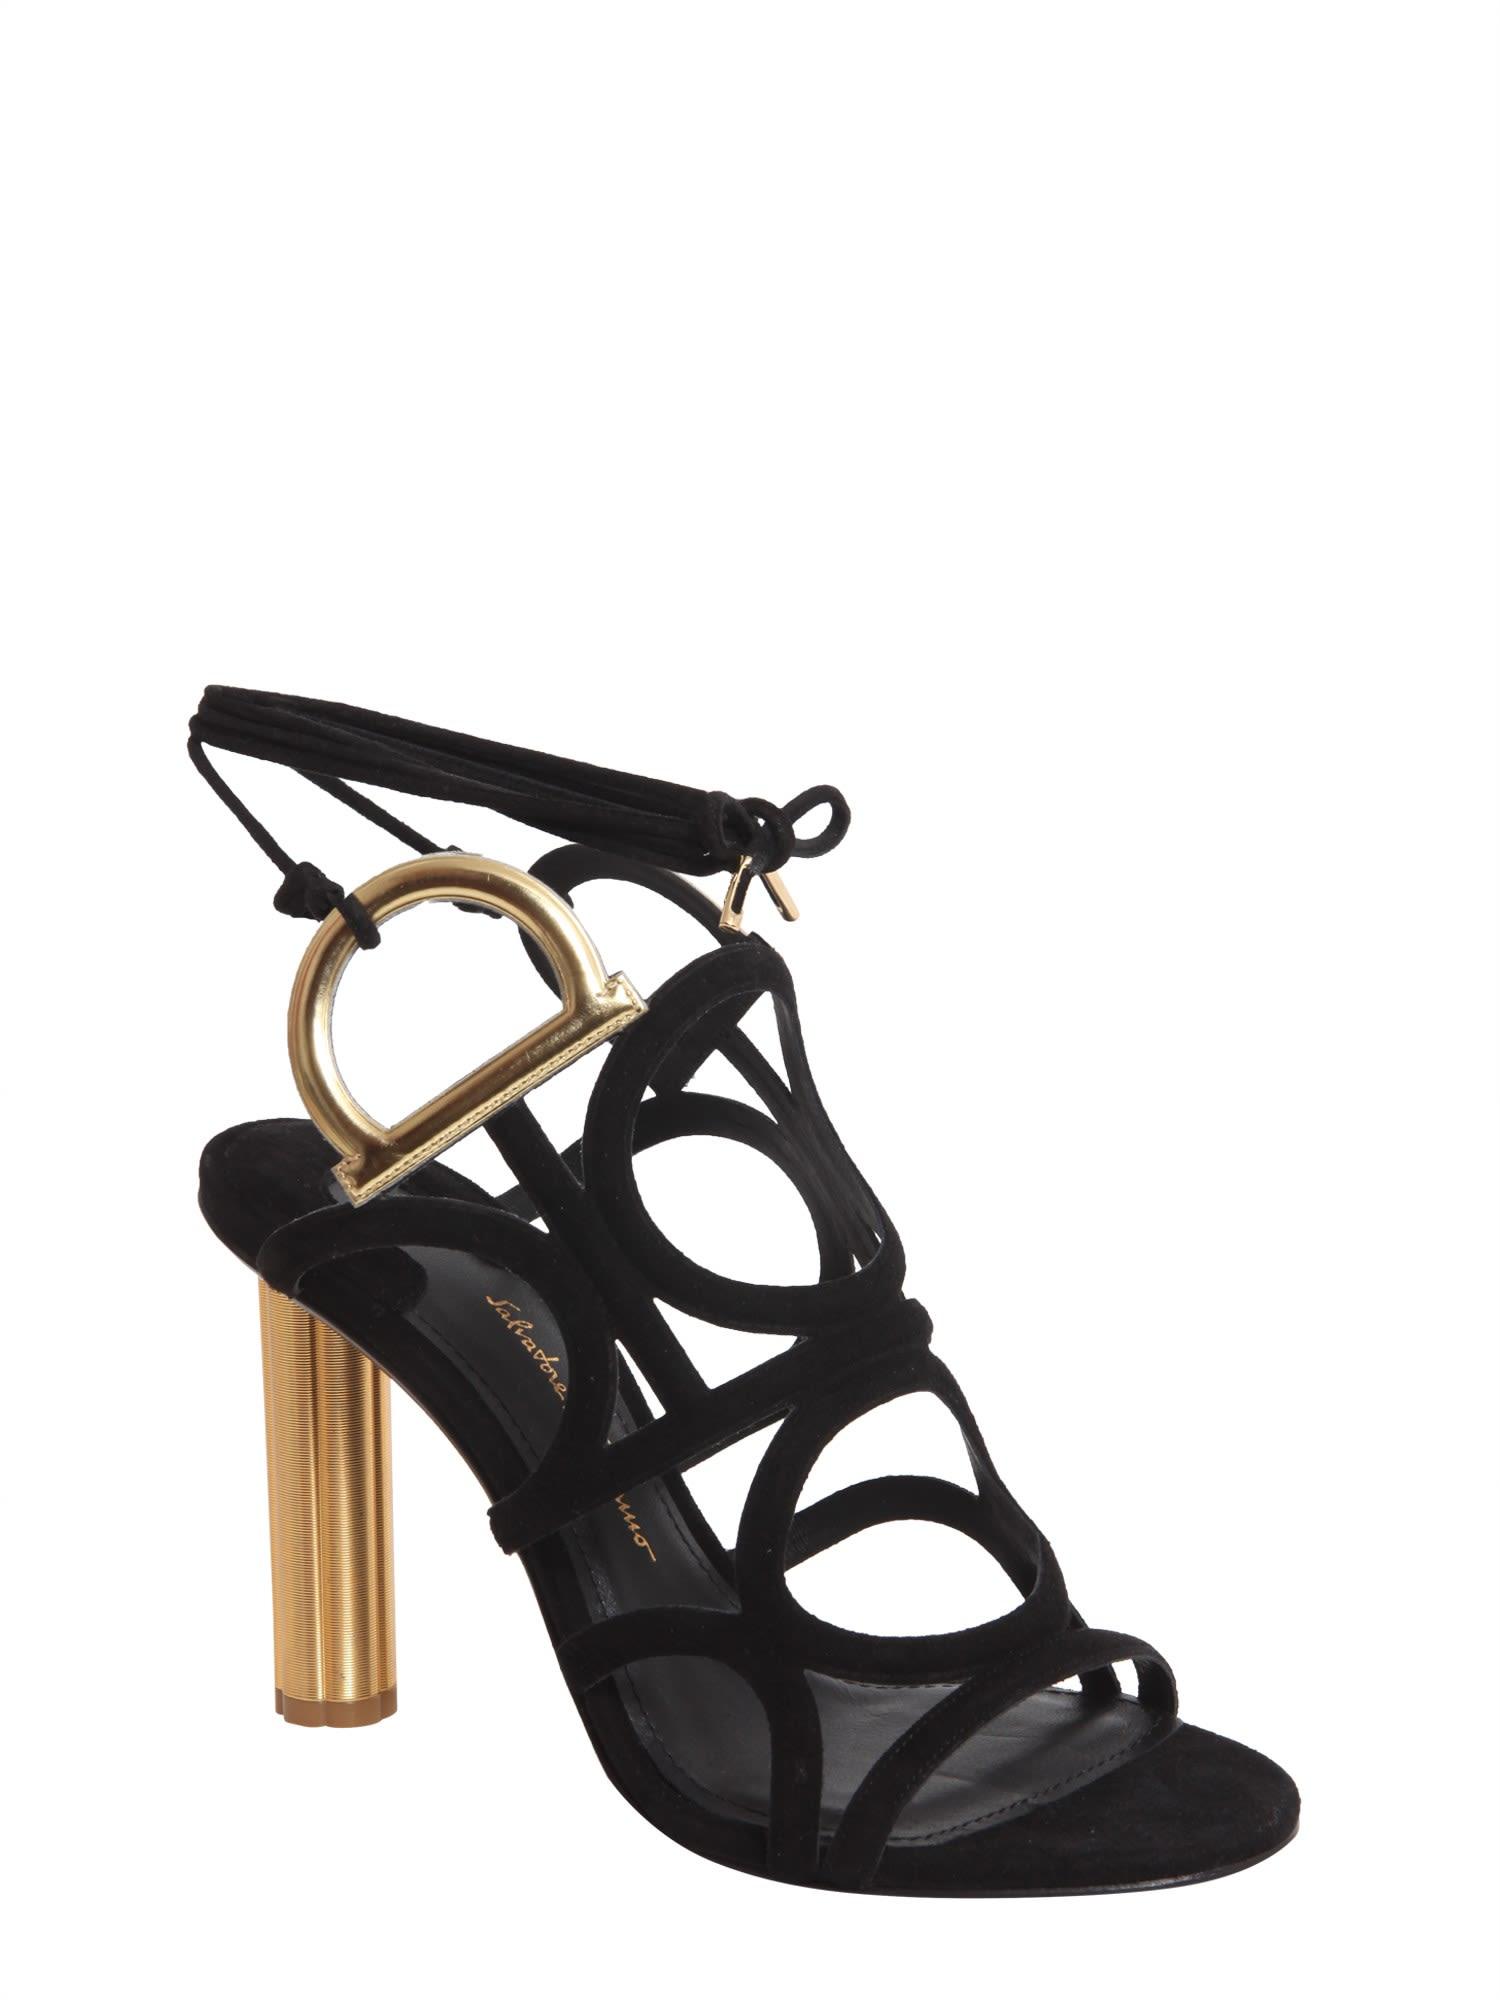 Salvatore Ferragamo Gancini sandals discount outlet store cheap sale store free shipping online jz0BxCVo8